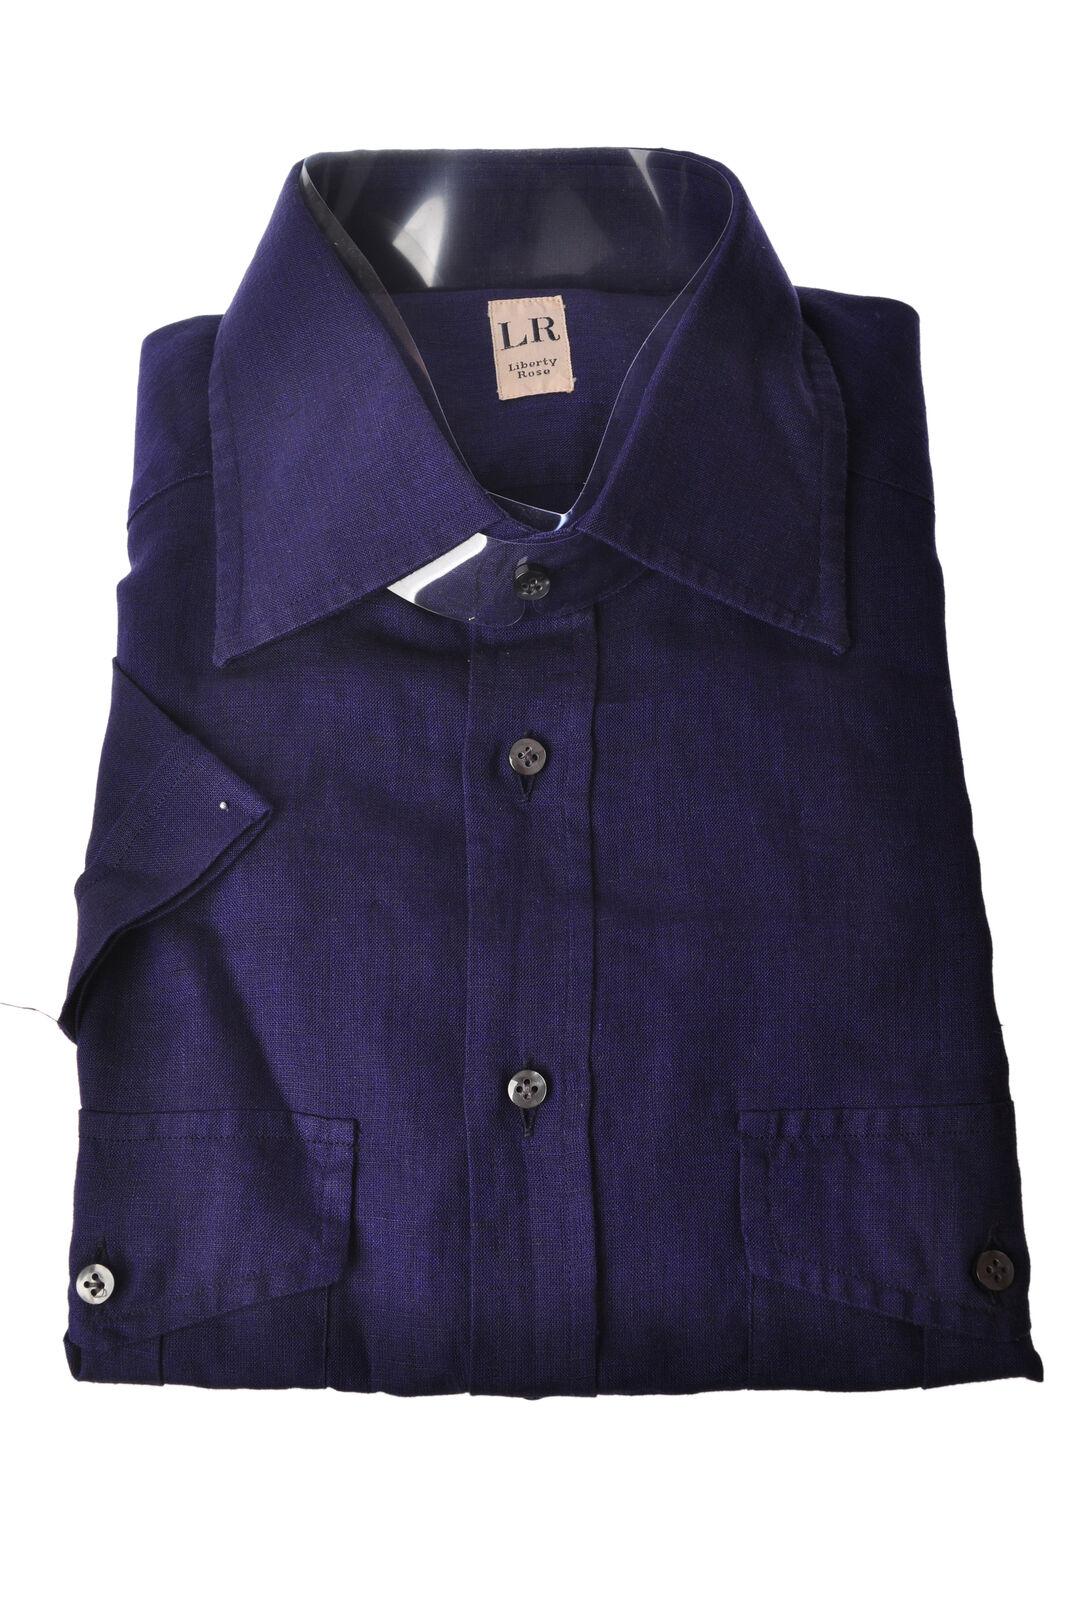 Liberty Rose  -  Shirt - Male - Blau - 3457821A182504